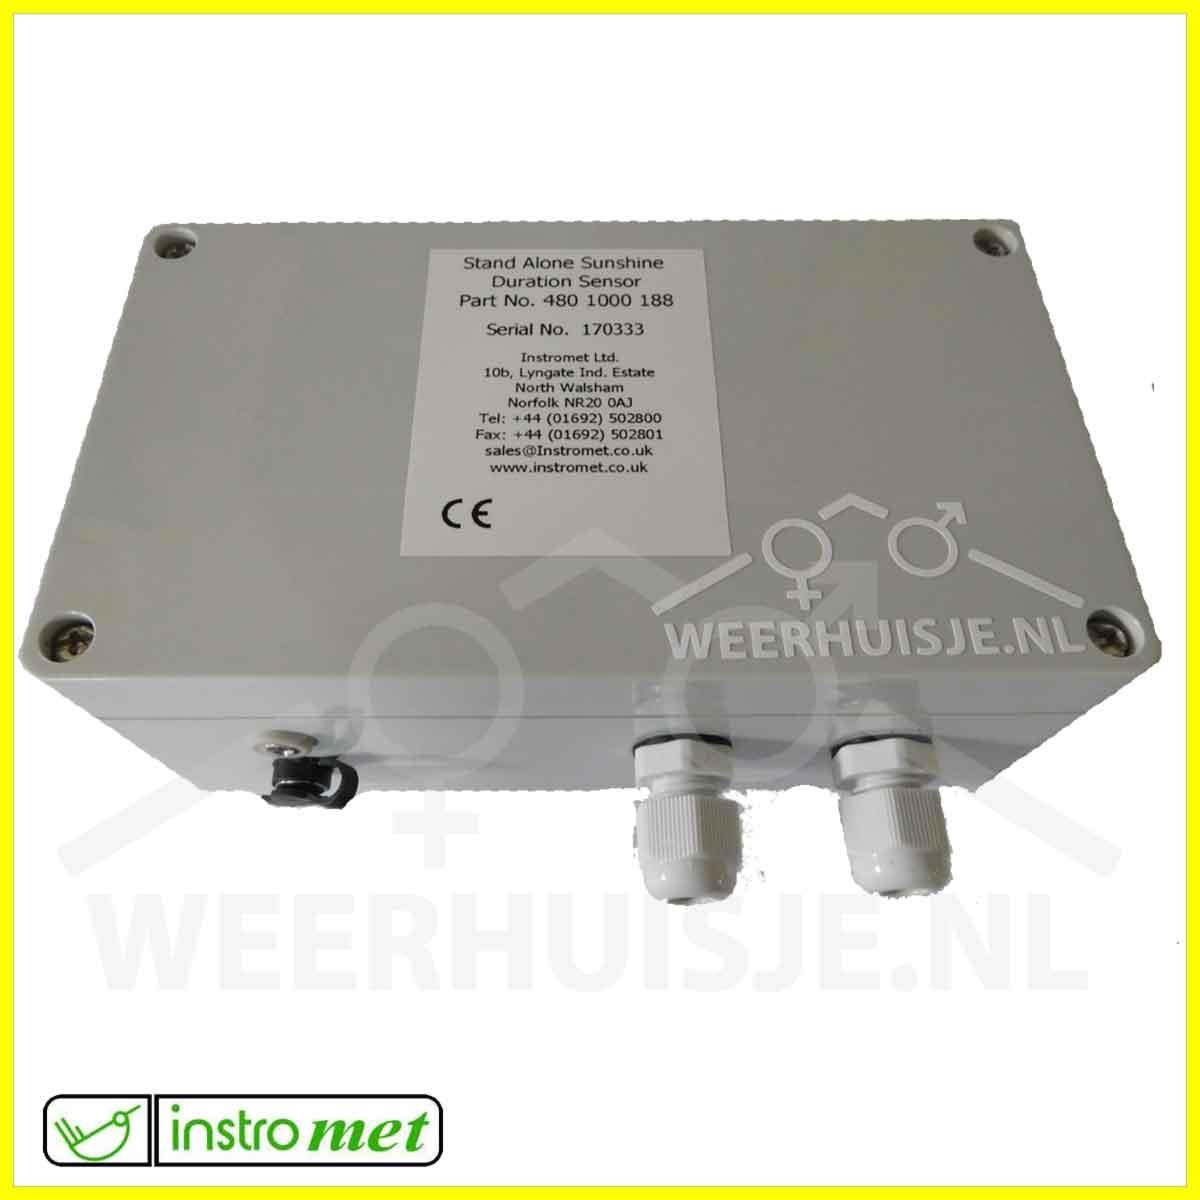 IM-Sun-webmb Instromet sun hours sensor pack